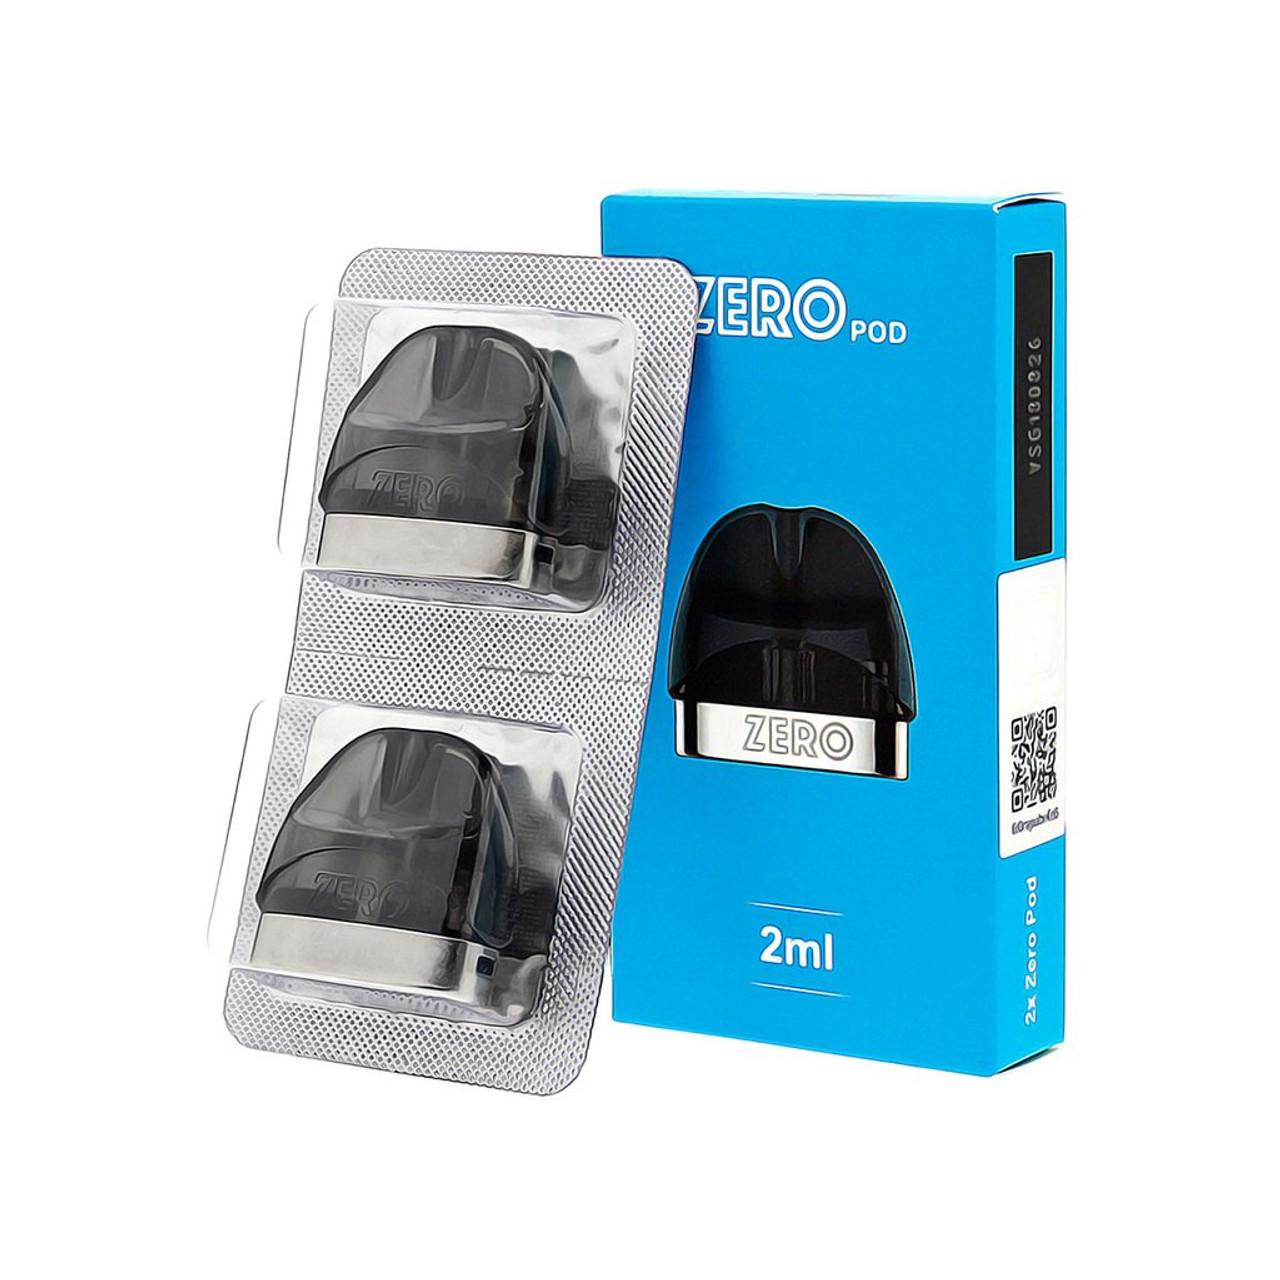 Vaporesso Renova Zero Replacement Pod Cartridges - 2 Pack